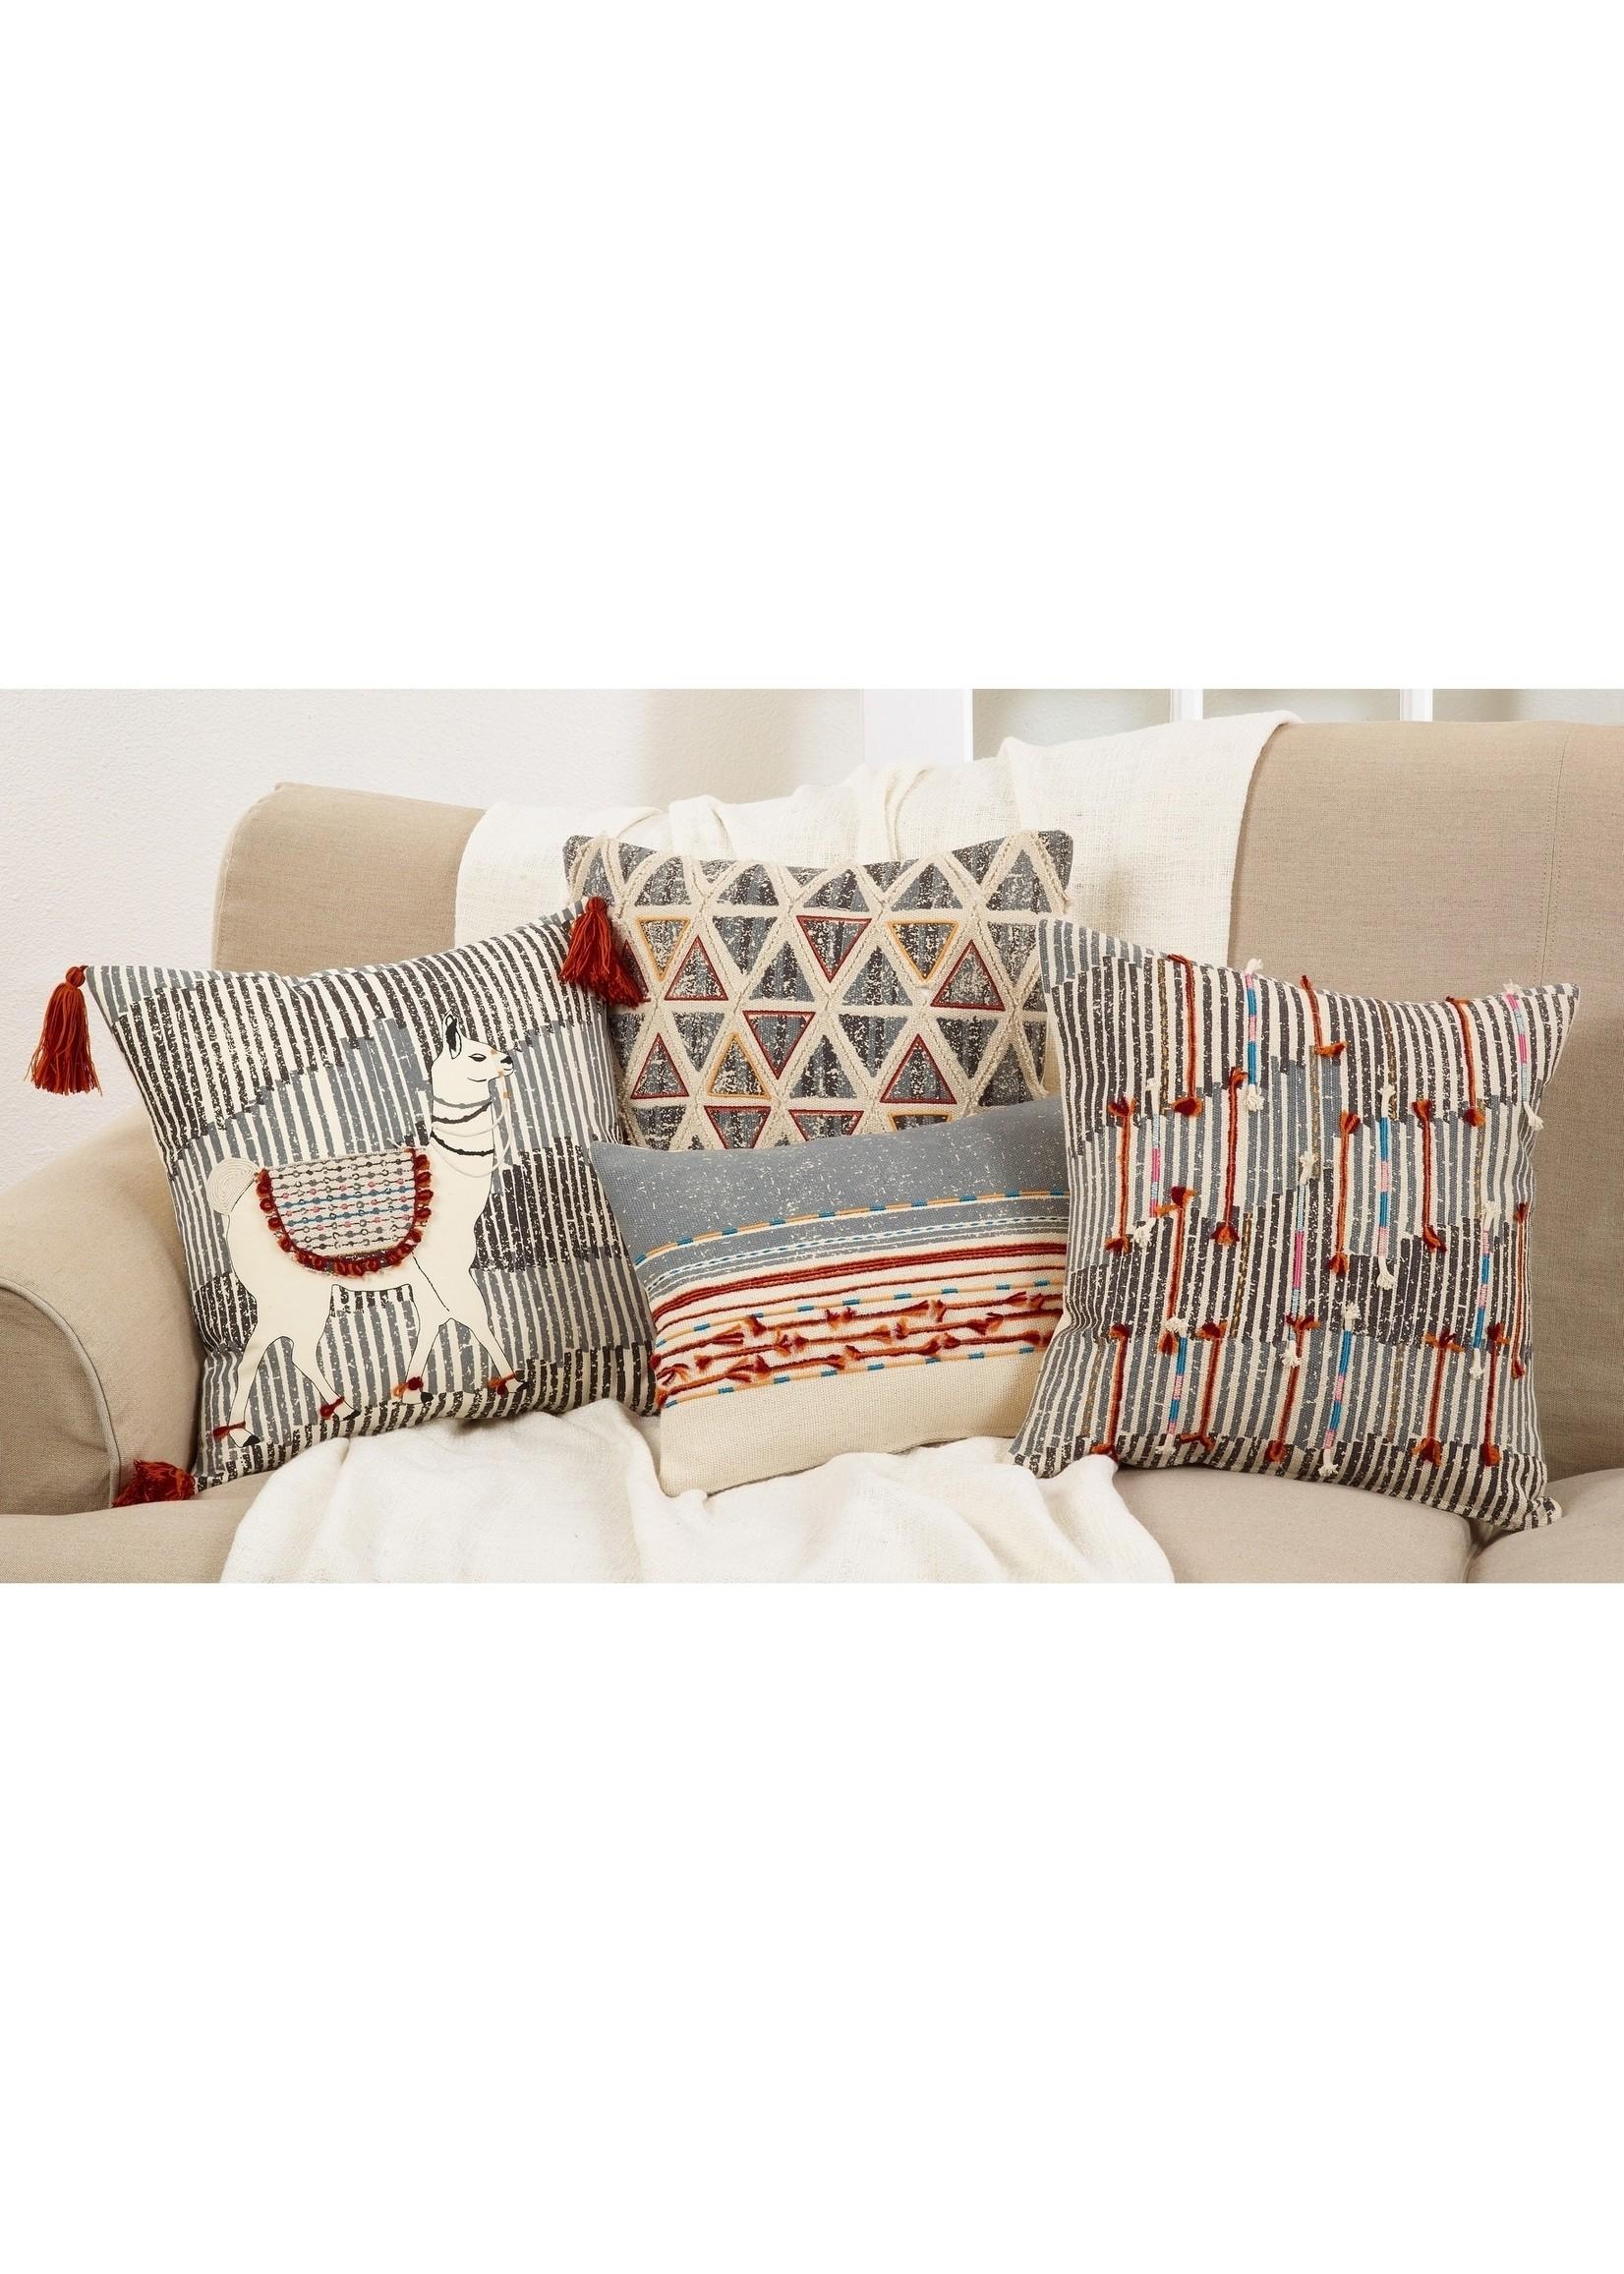 Saro Cord Applique Pillow - Multi